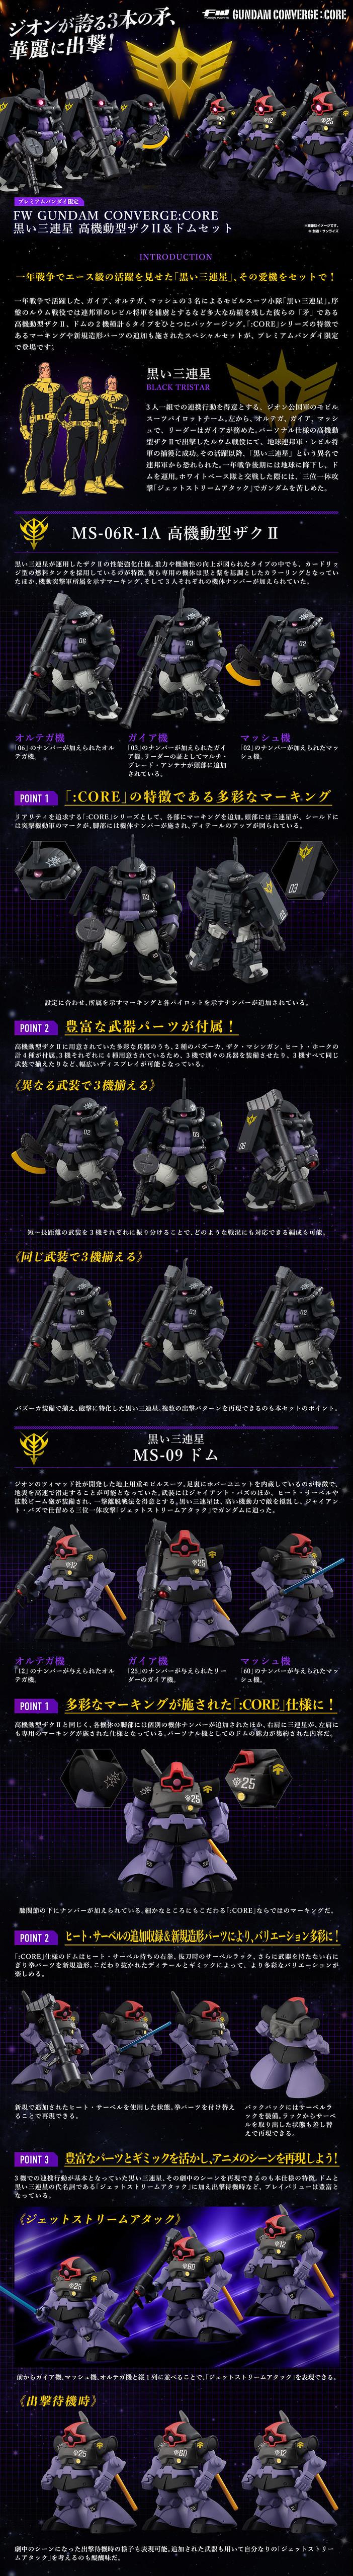 FW GUNDAM CONVERGE:CORE「黑色三連星 高機動型薩克II&德姆套組」商品情報公開!